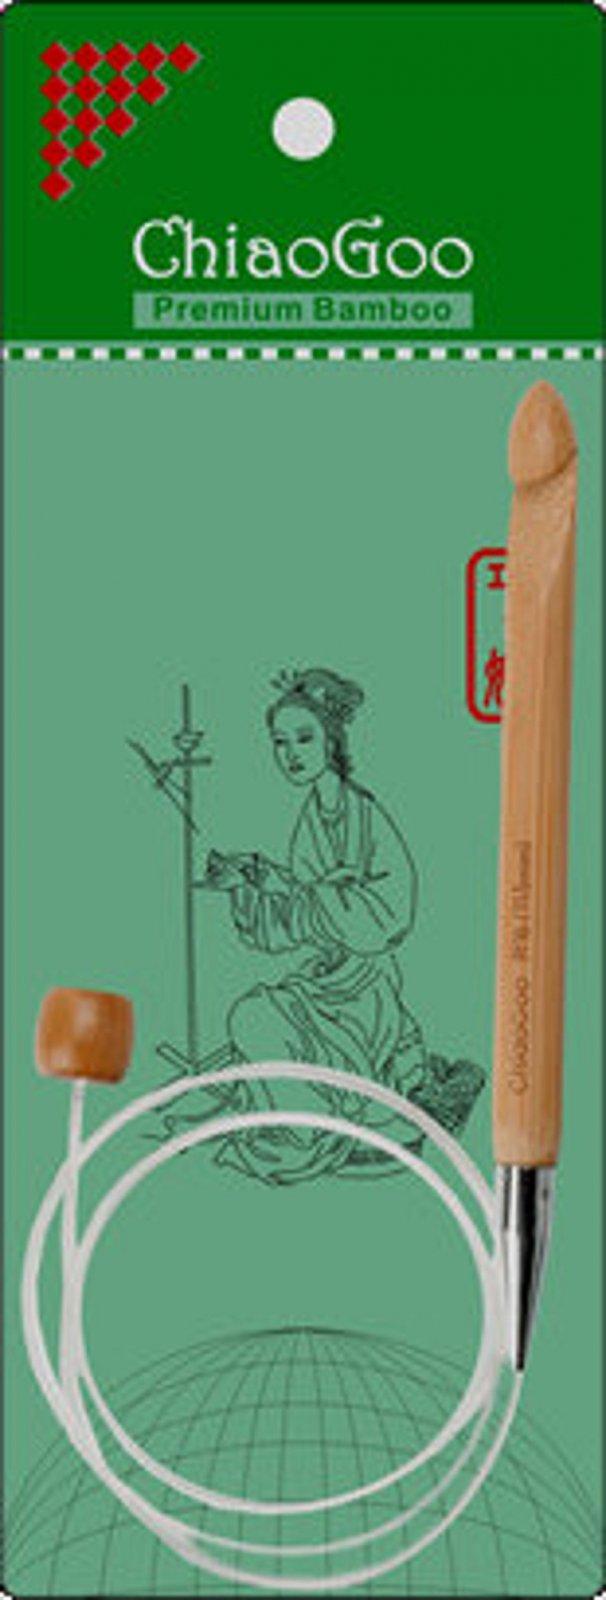 Chiao Goo Premium Bamboo Circular Hook